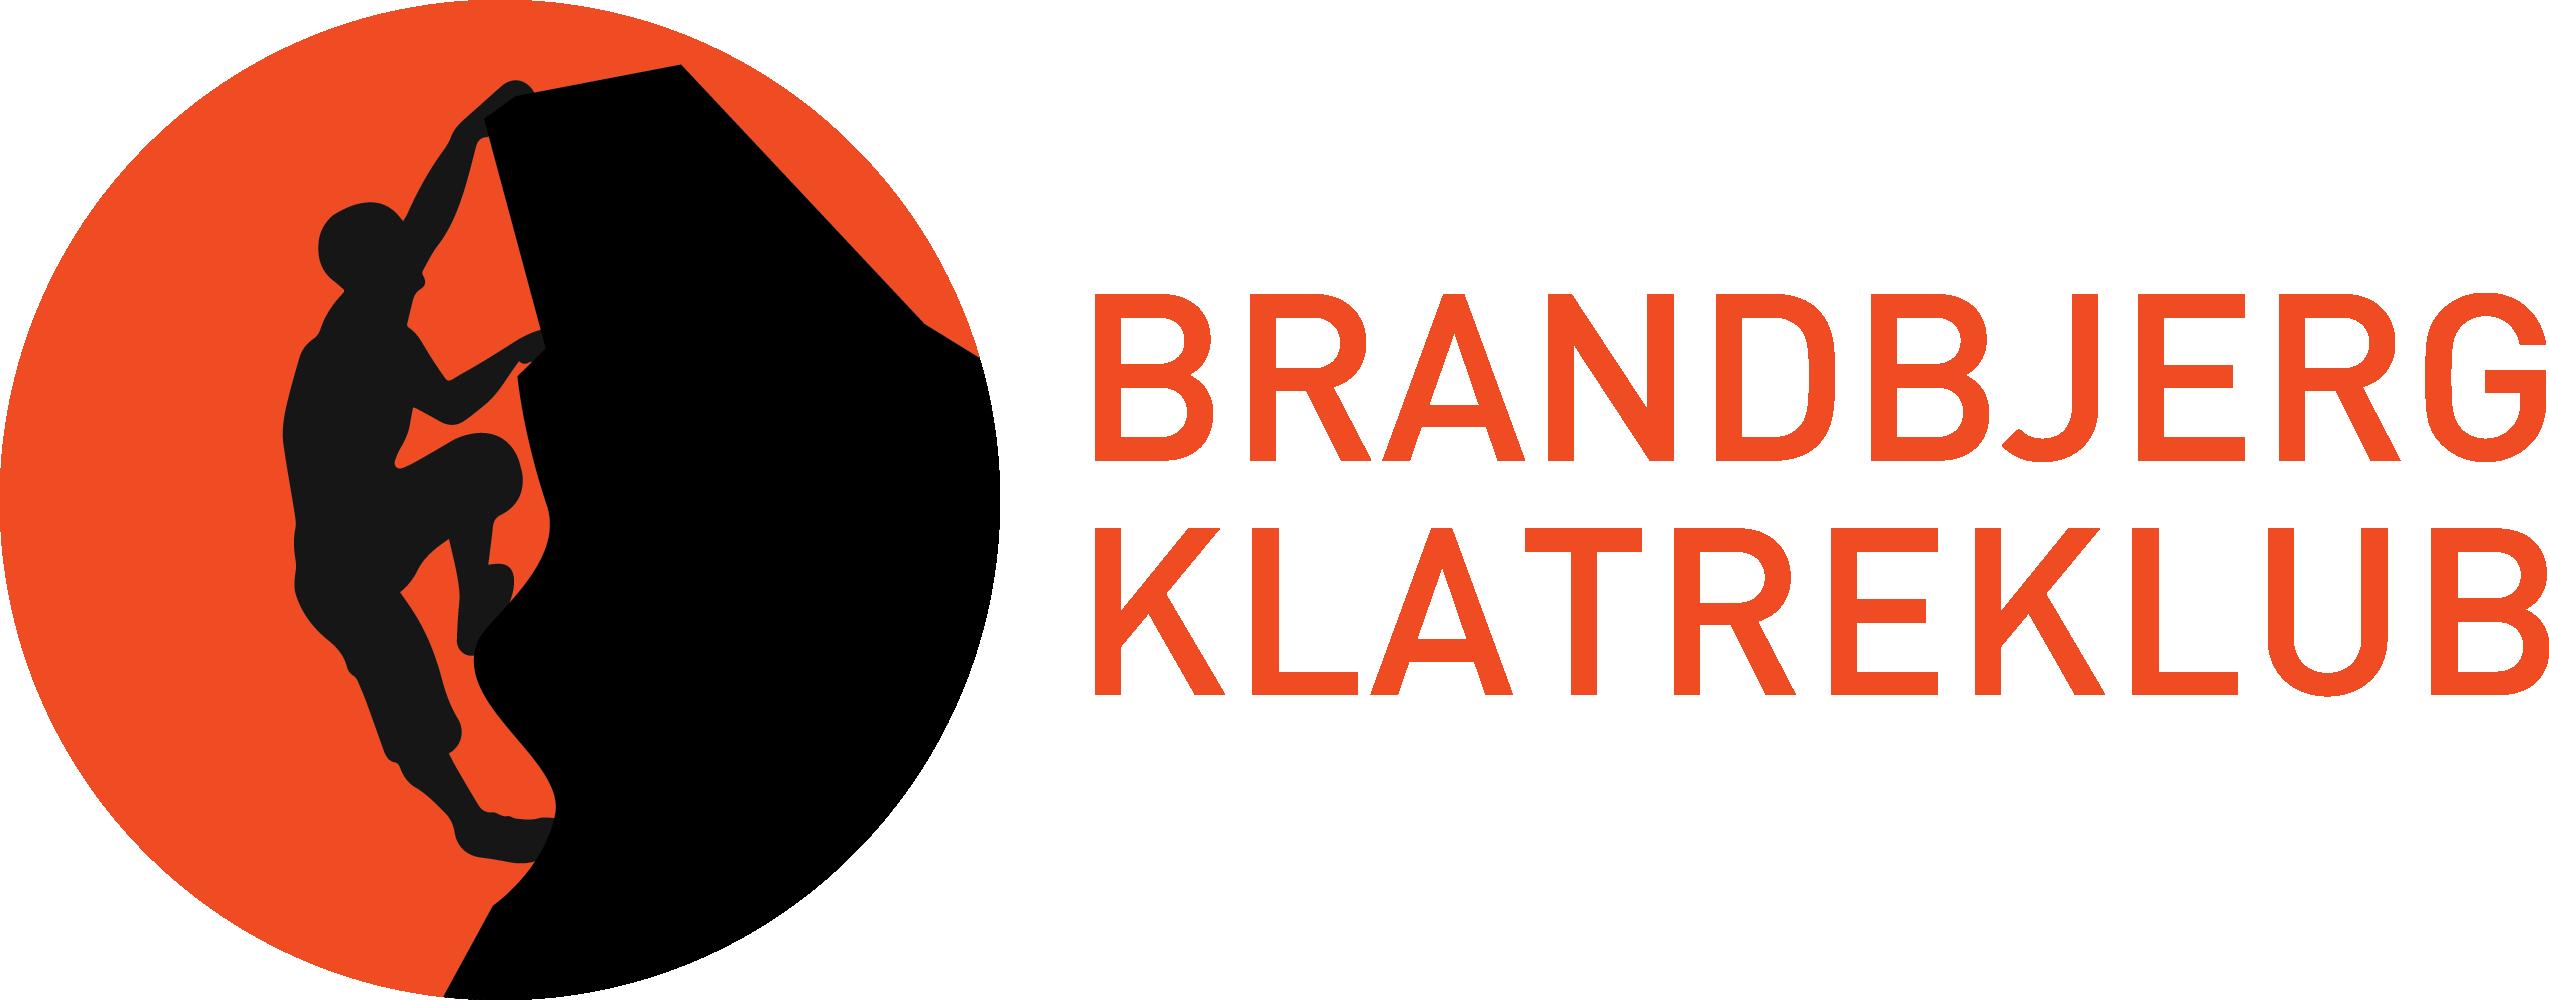 Brandbjerg Klatreklub